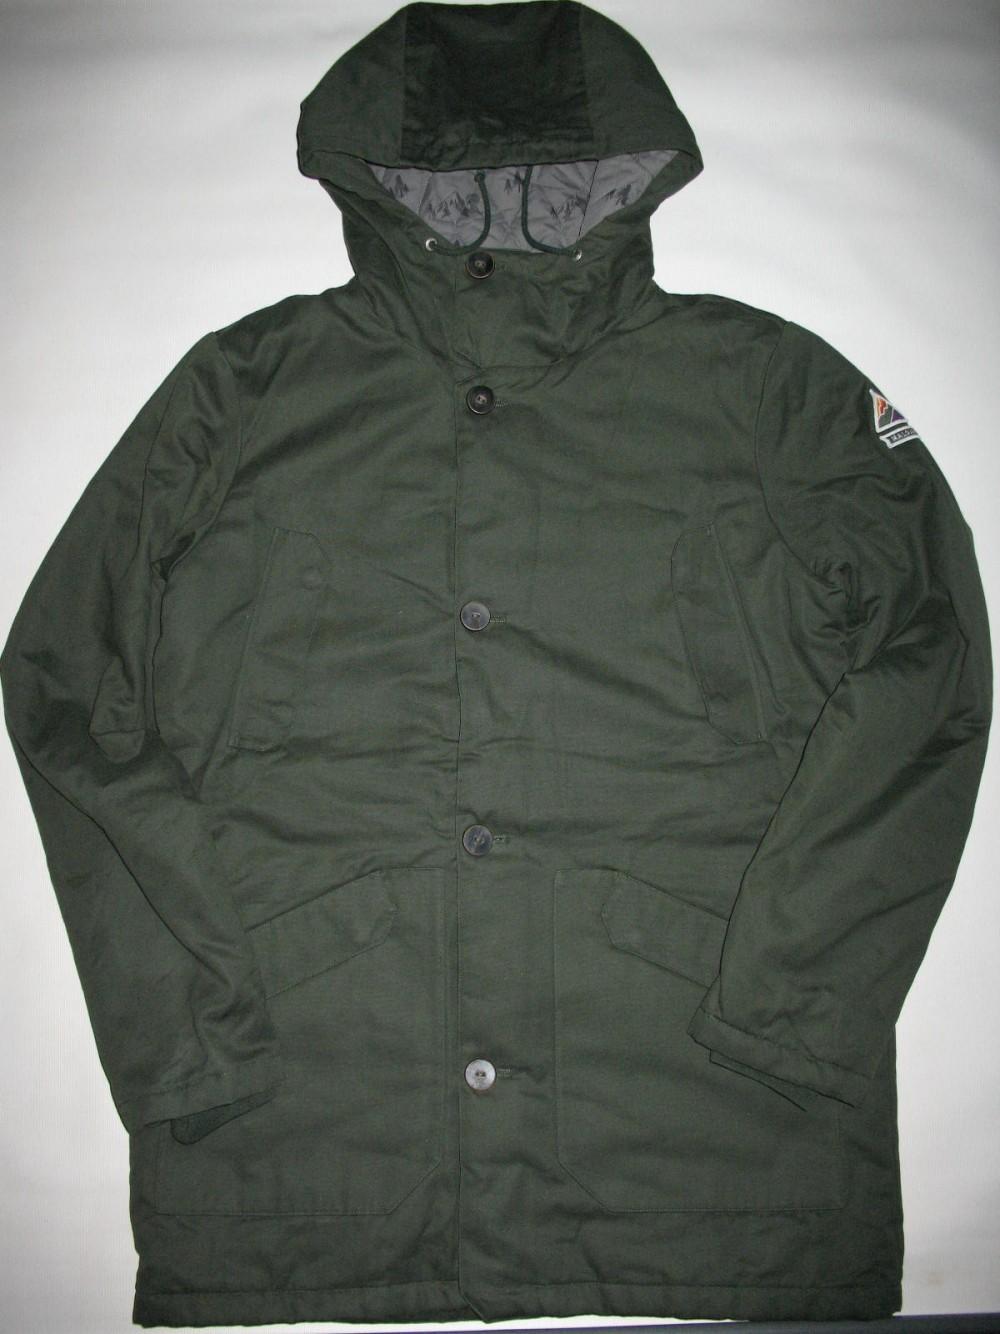 Куртка MALOJA halifax primaloft jacket (размер L) - 2